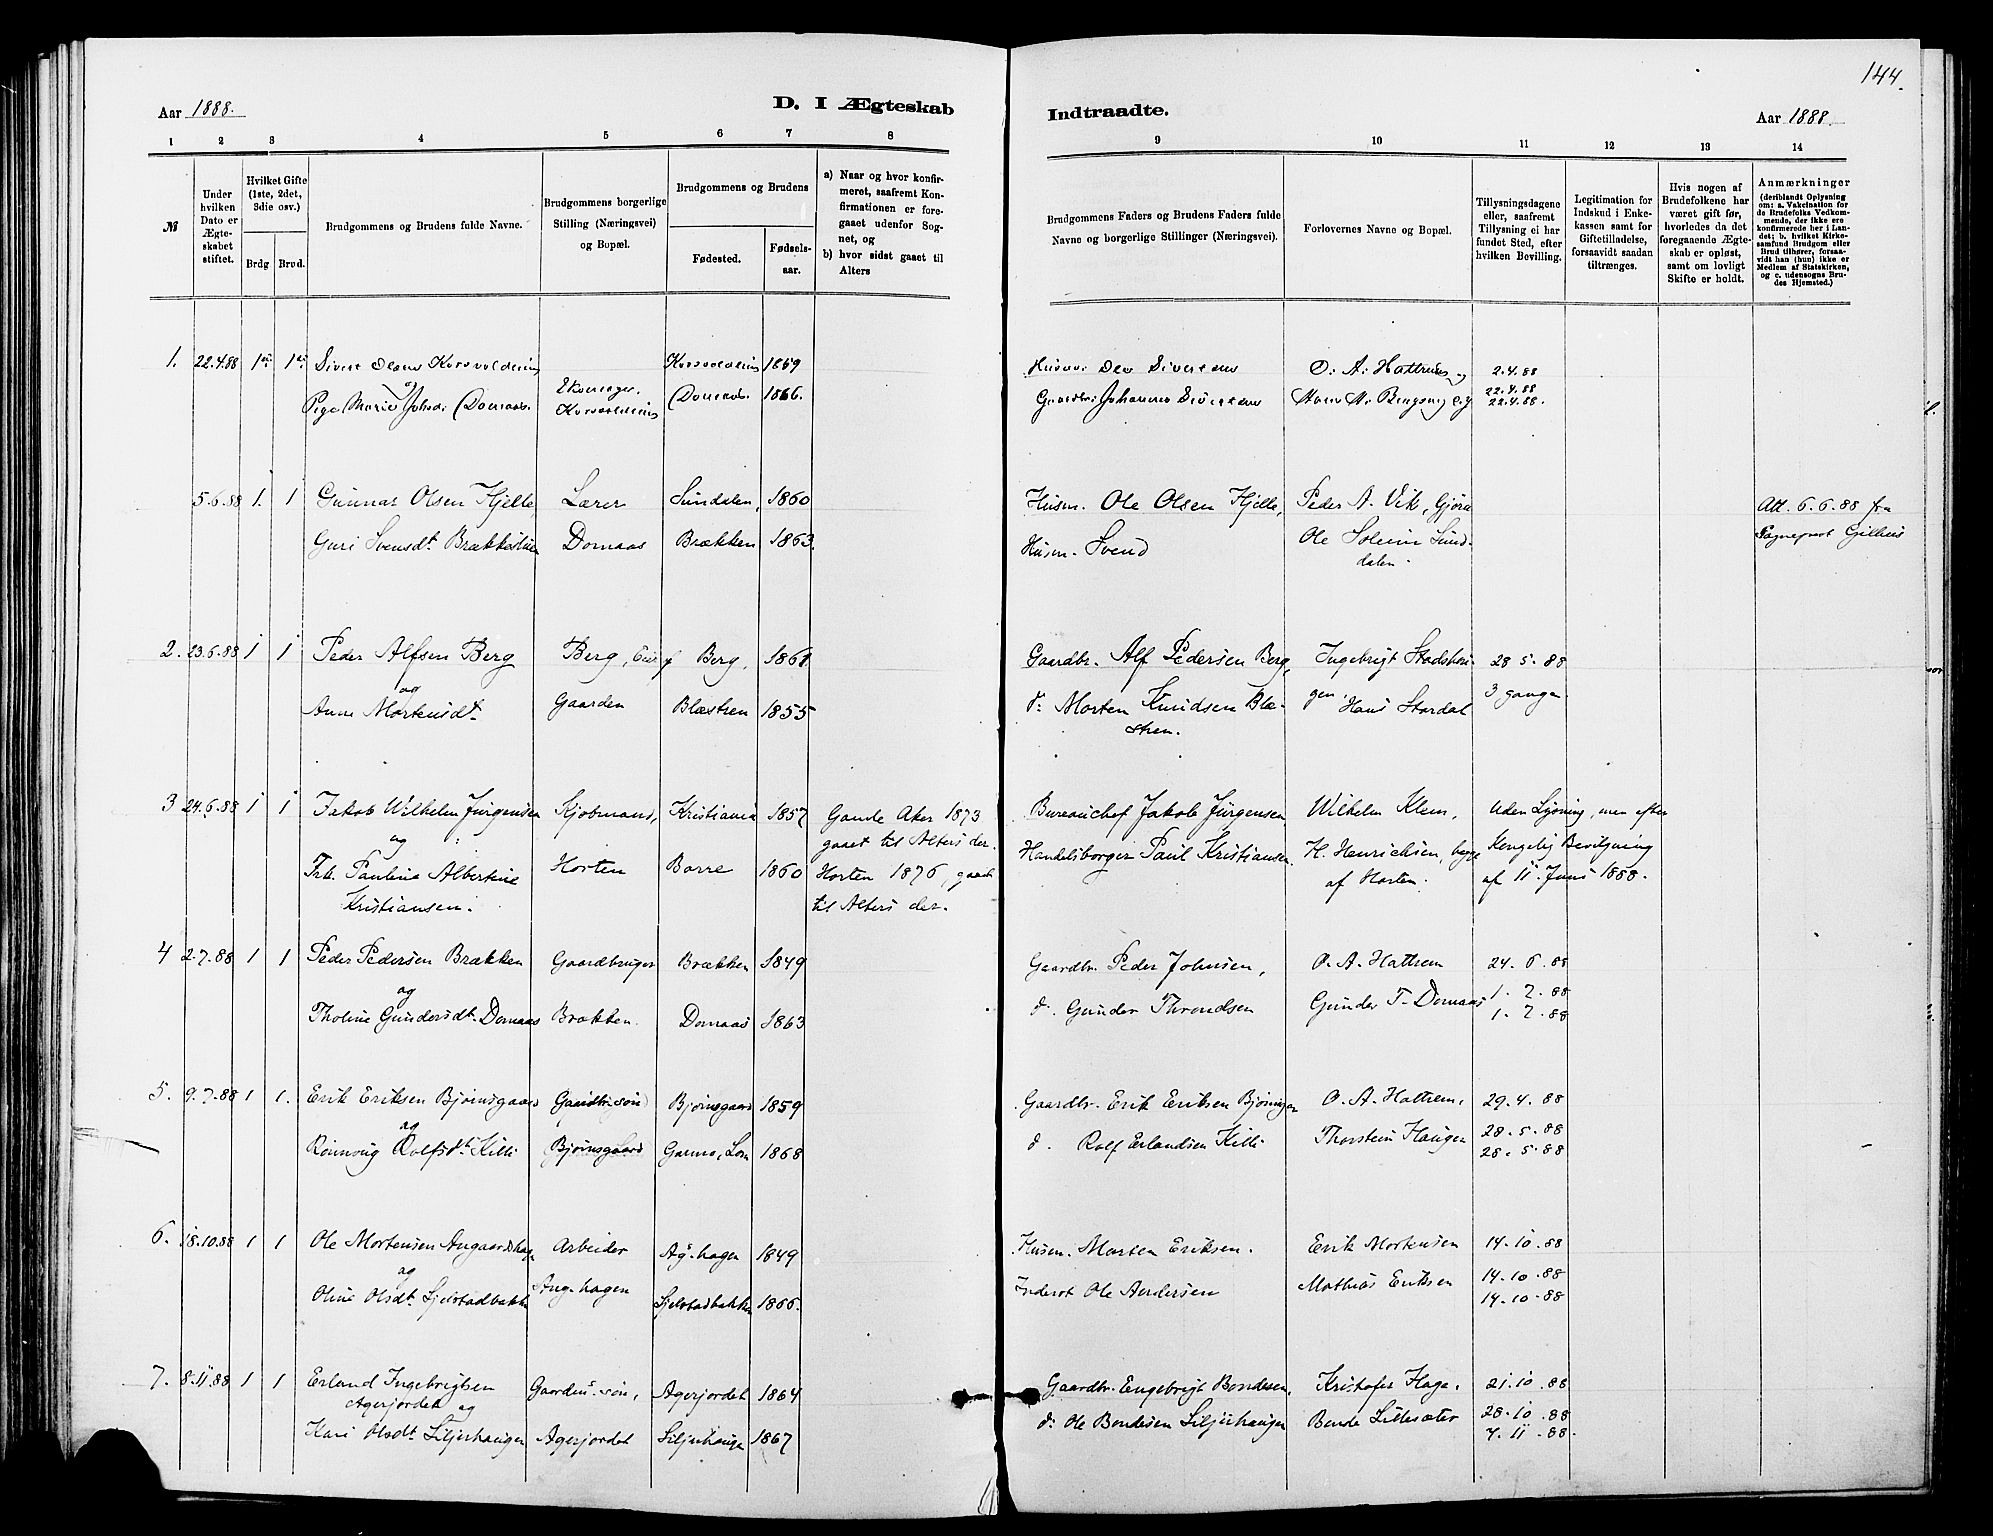 SAH, Dovre prestekontor, Ministerialbok nr. 2, 1879-1890, s. 144